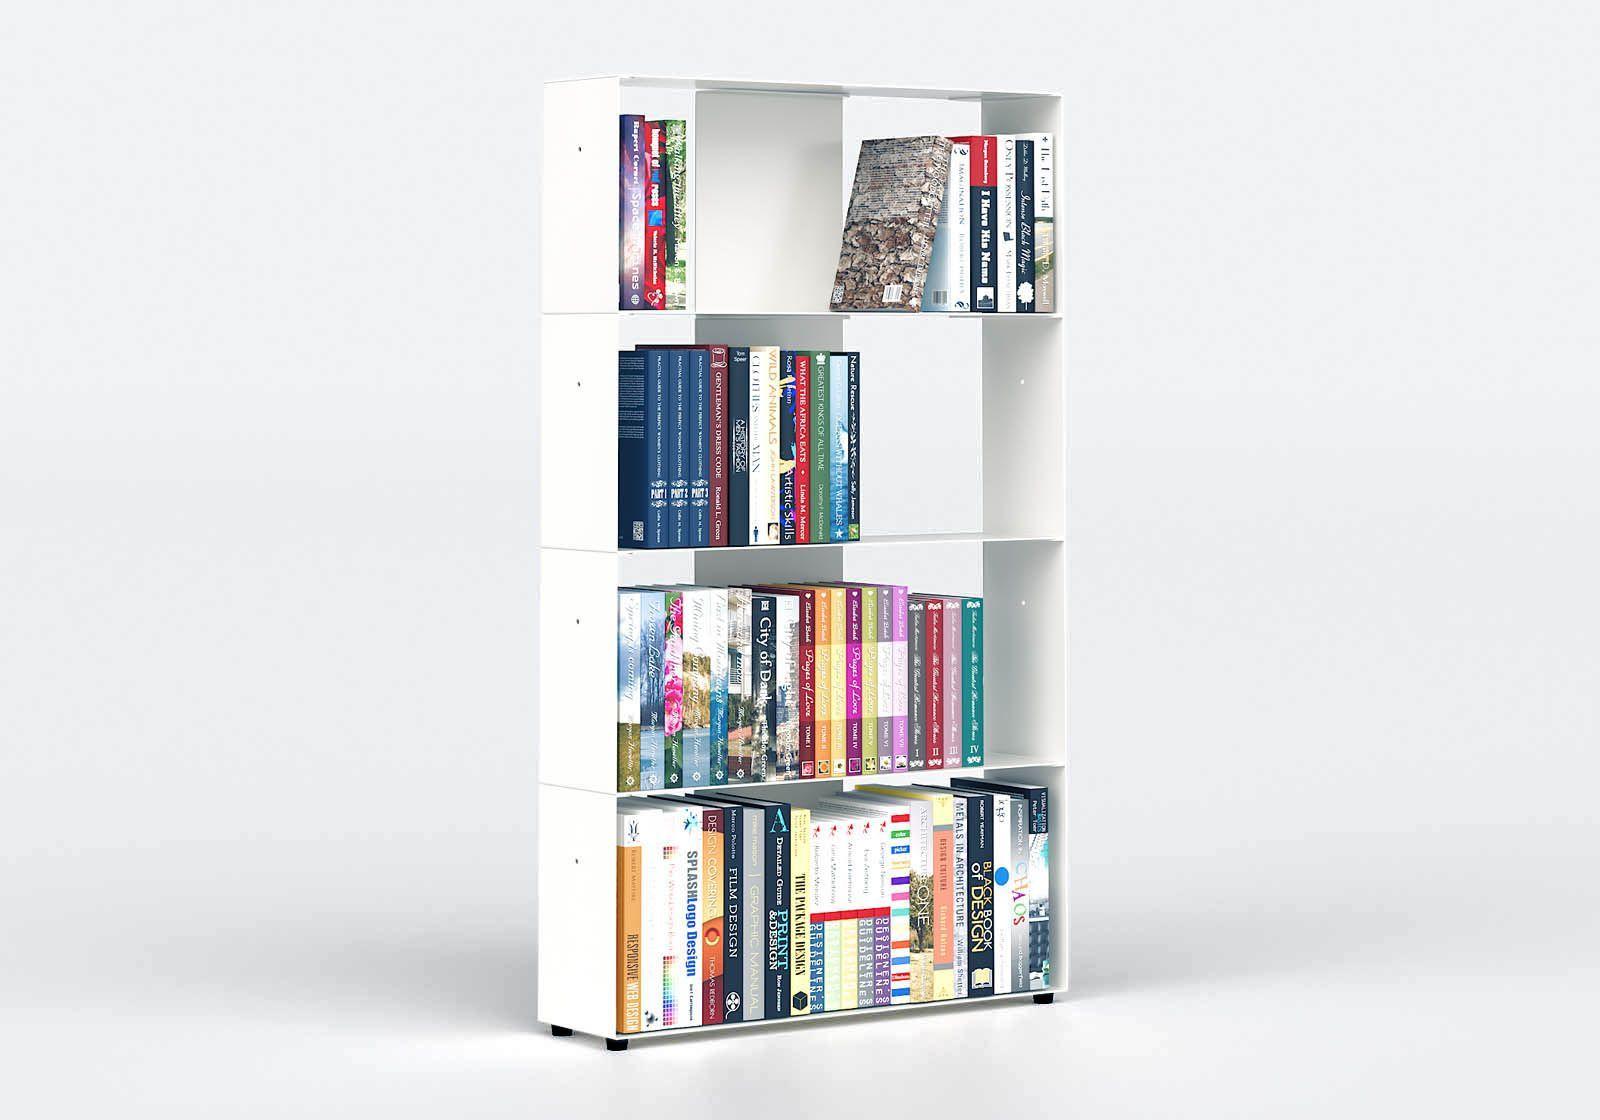 White Bookcase W60 H100 D15 cm - 4 shelves